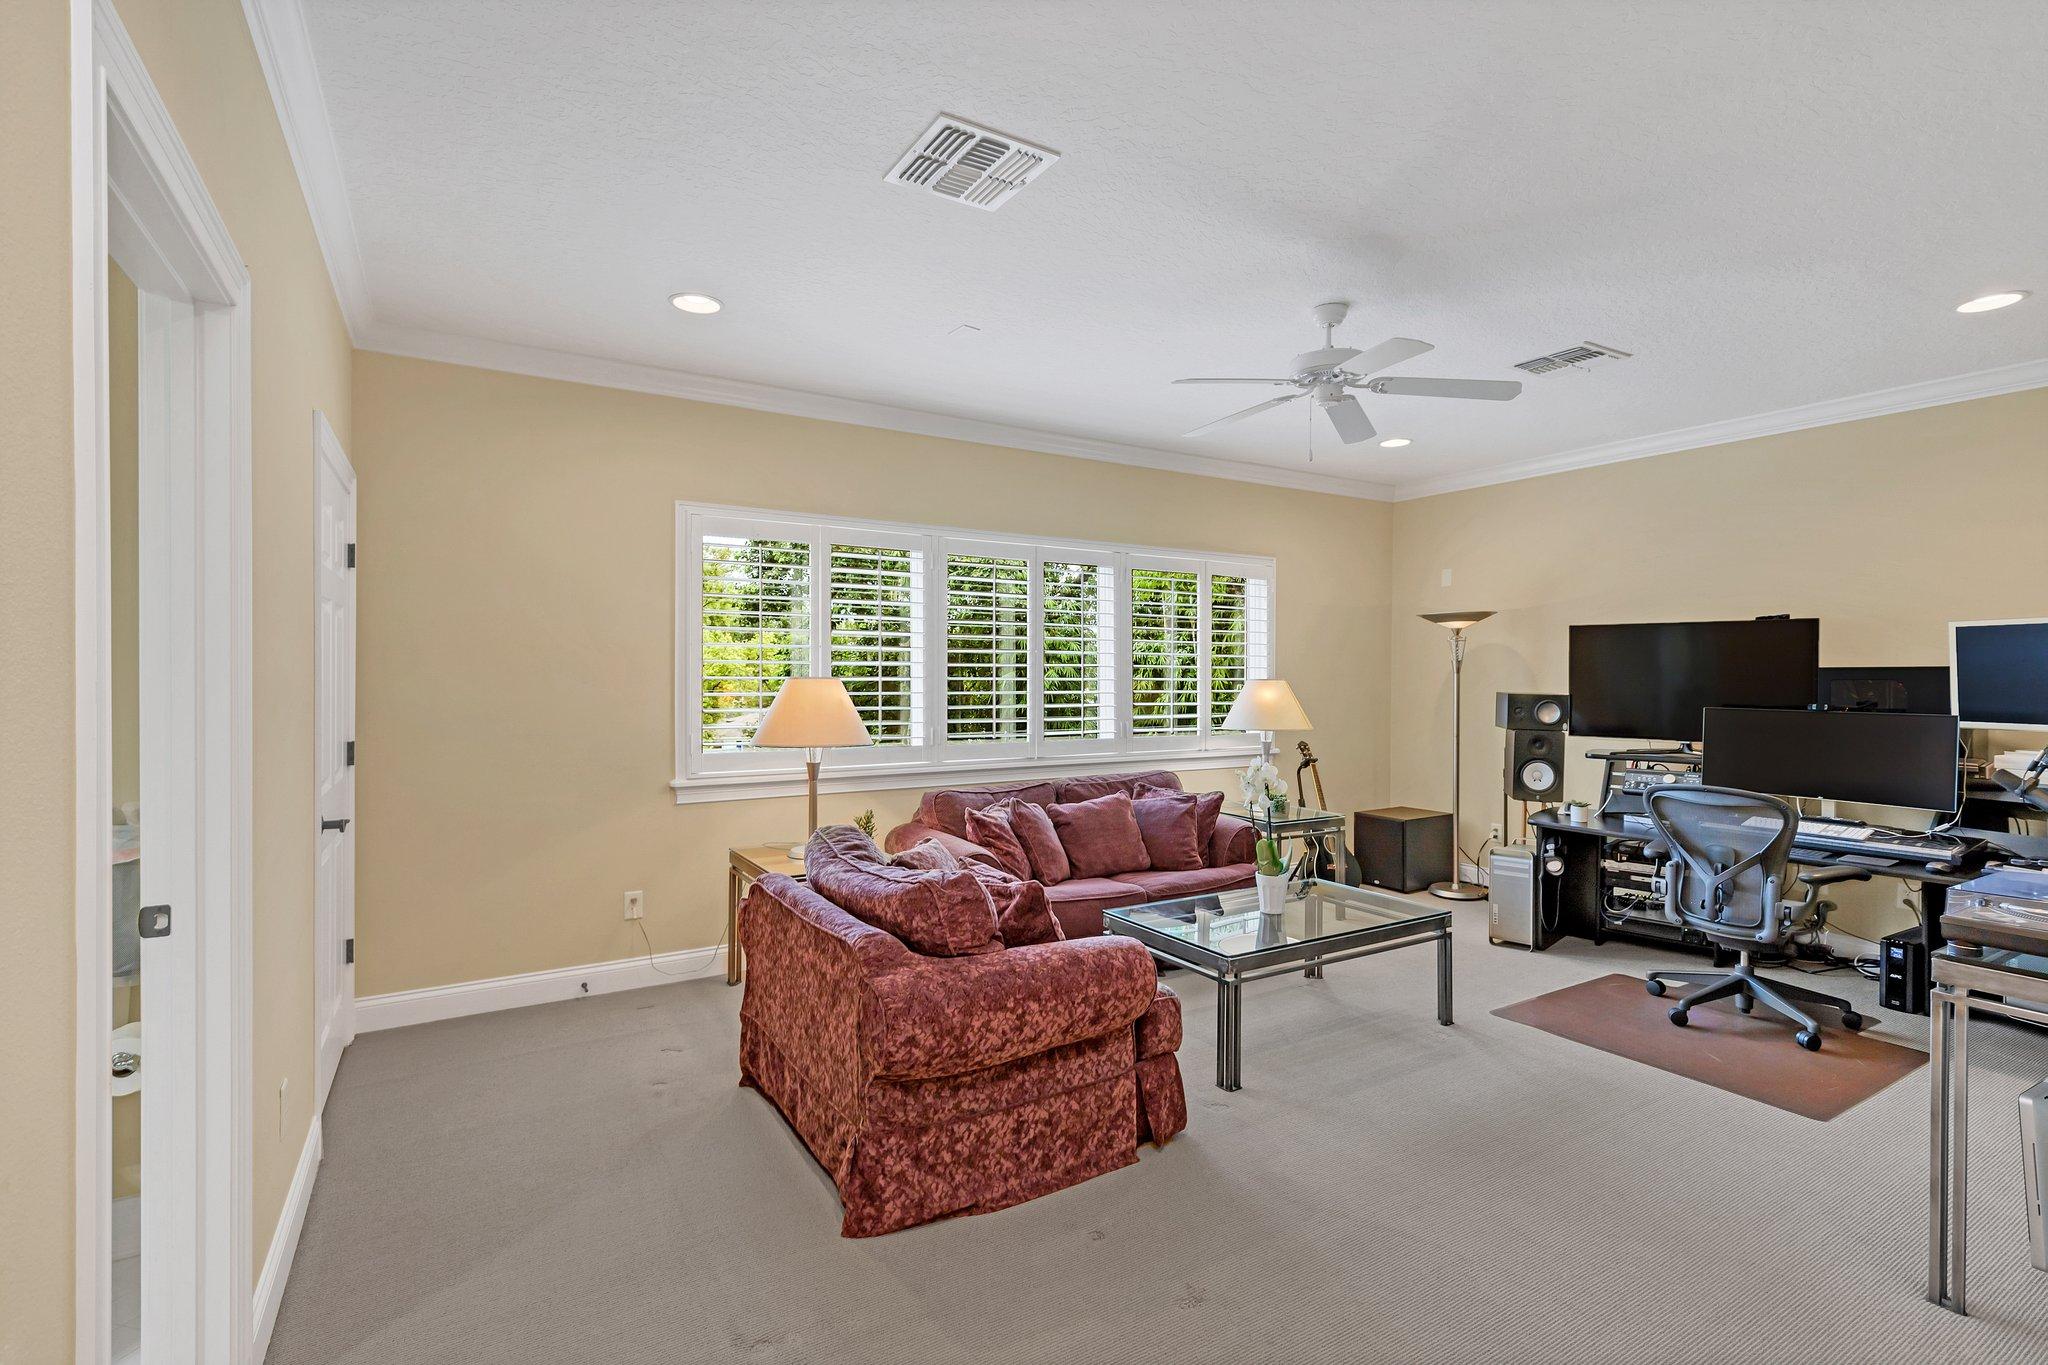 123 Tangelo Ct, Maitland, FL 32751, USA Photo 24